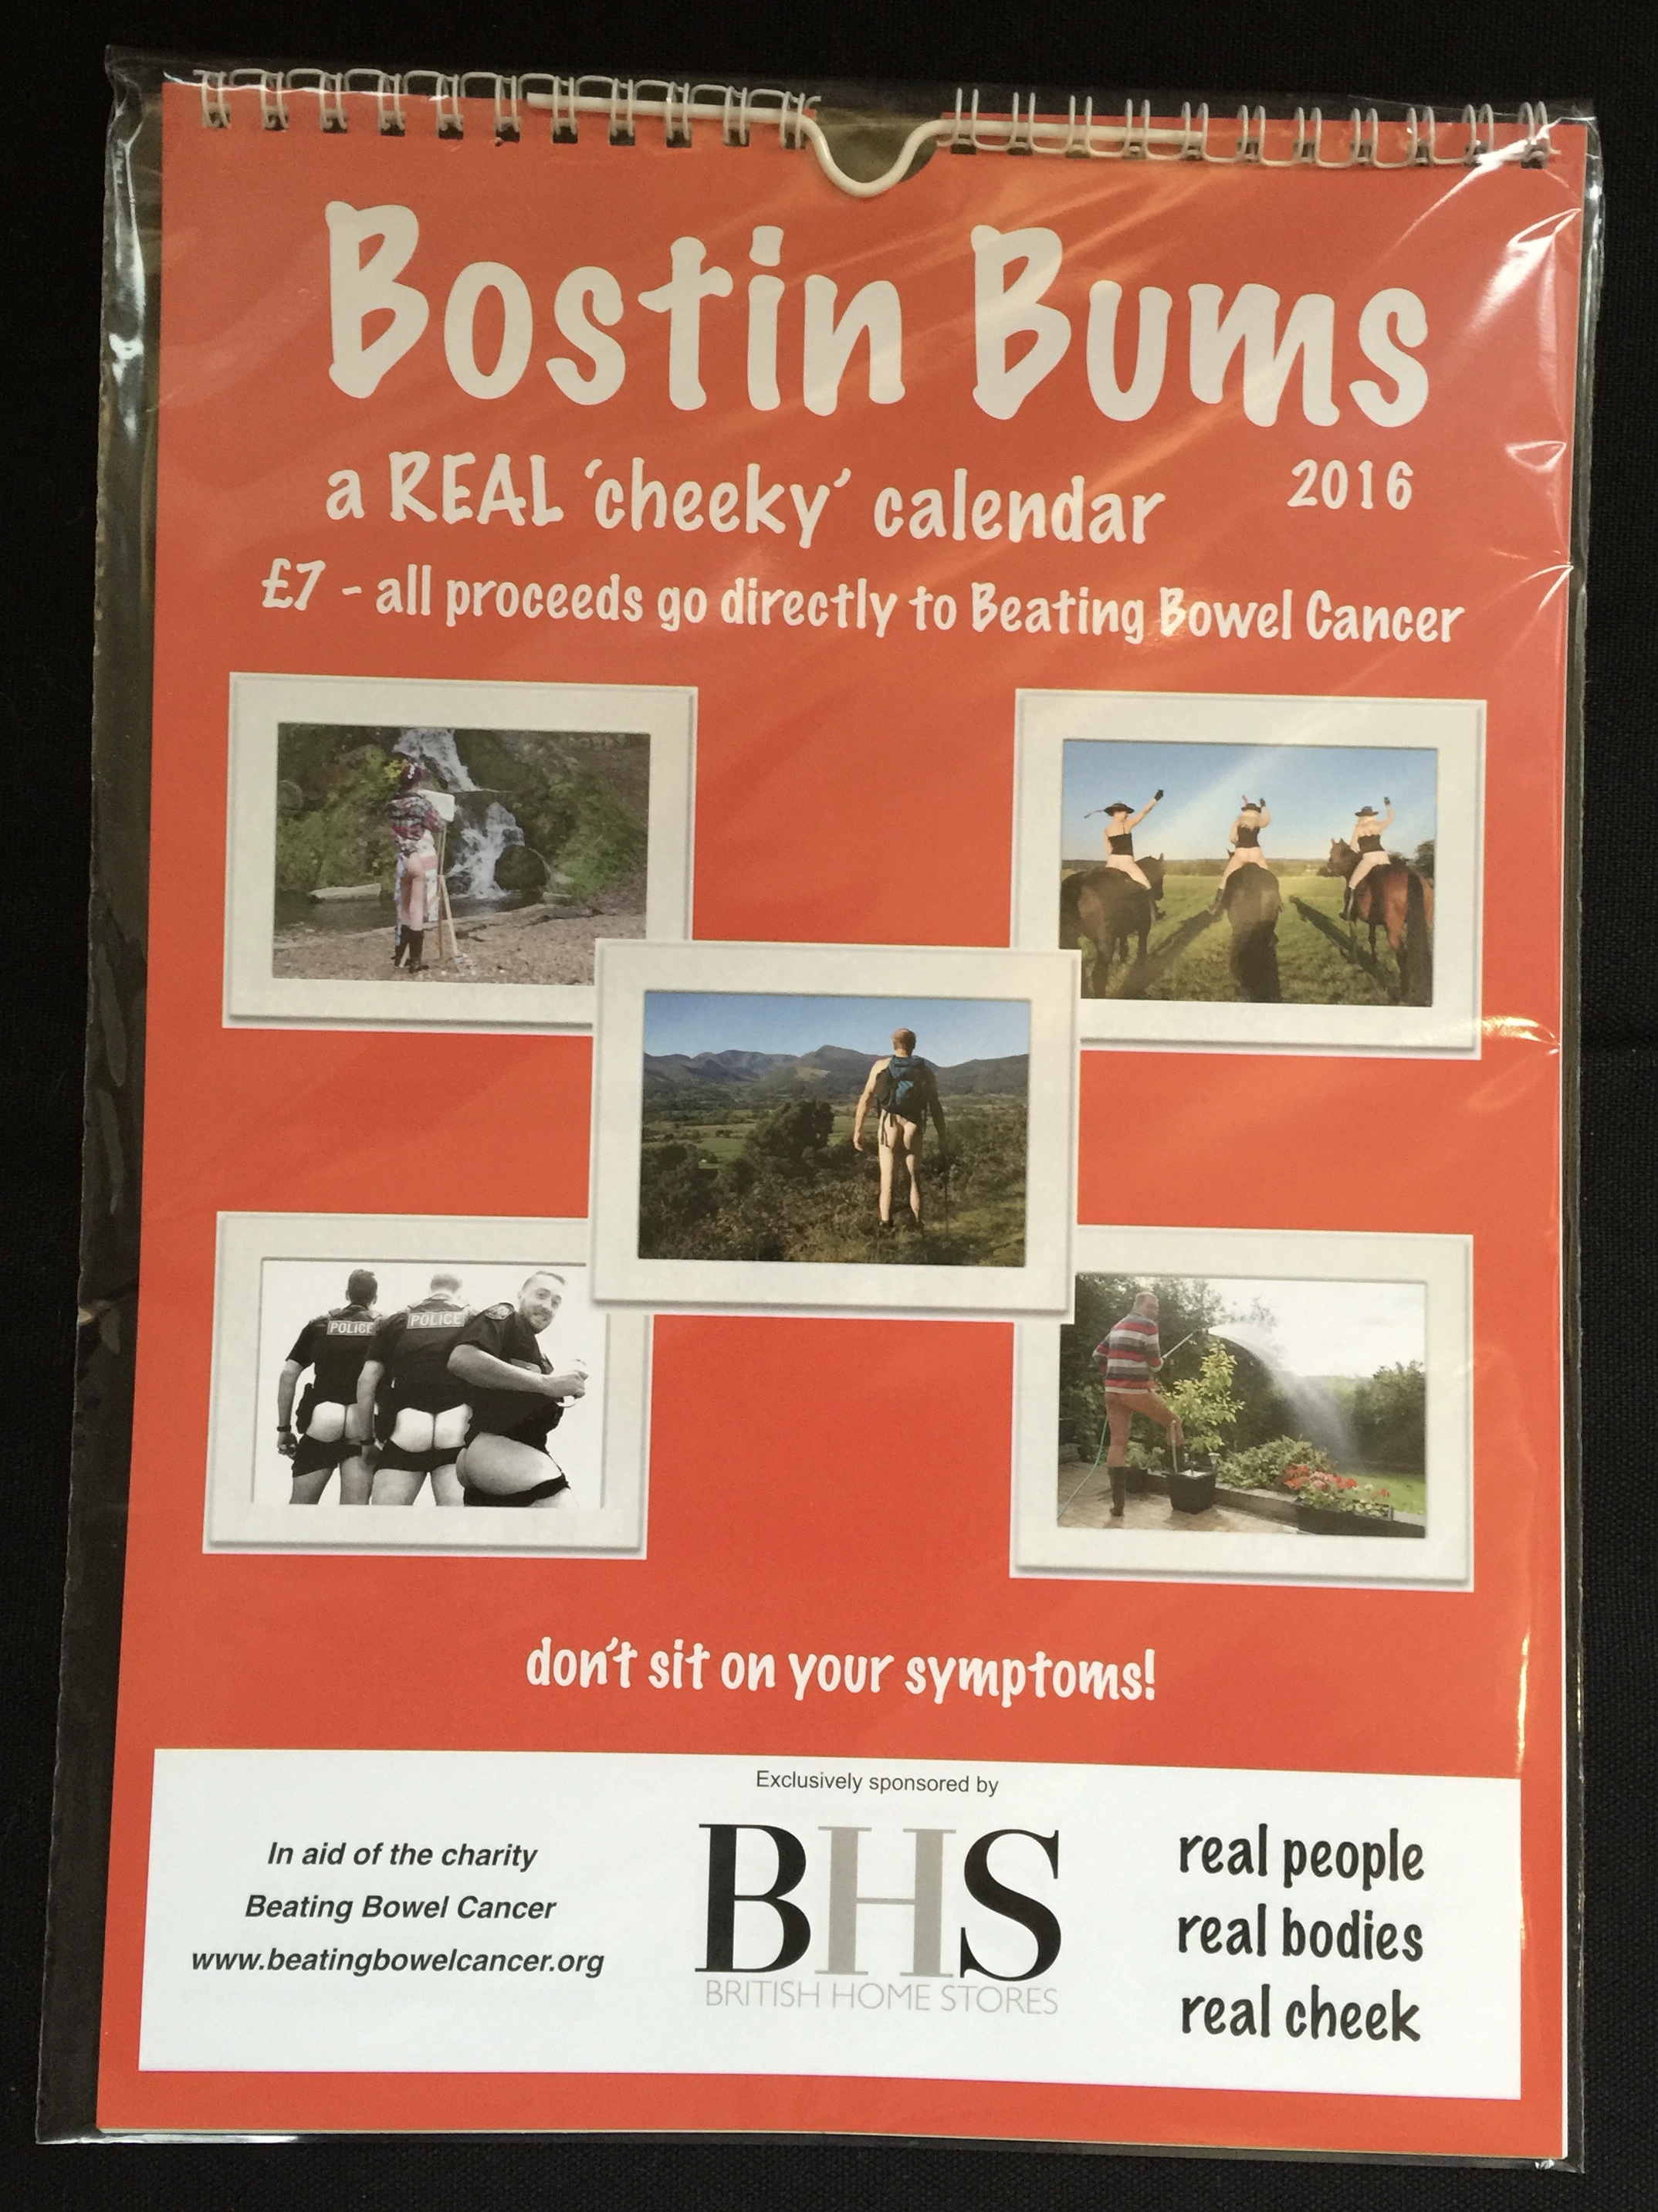 Bostin Bums